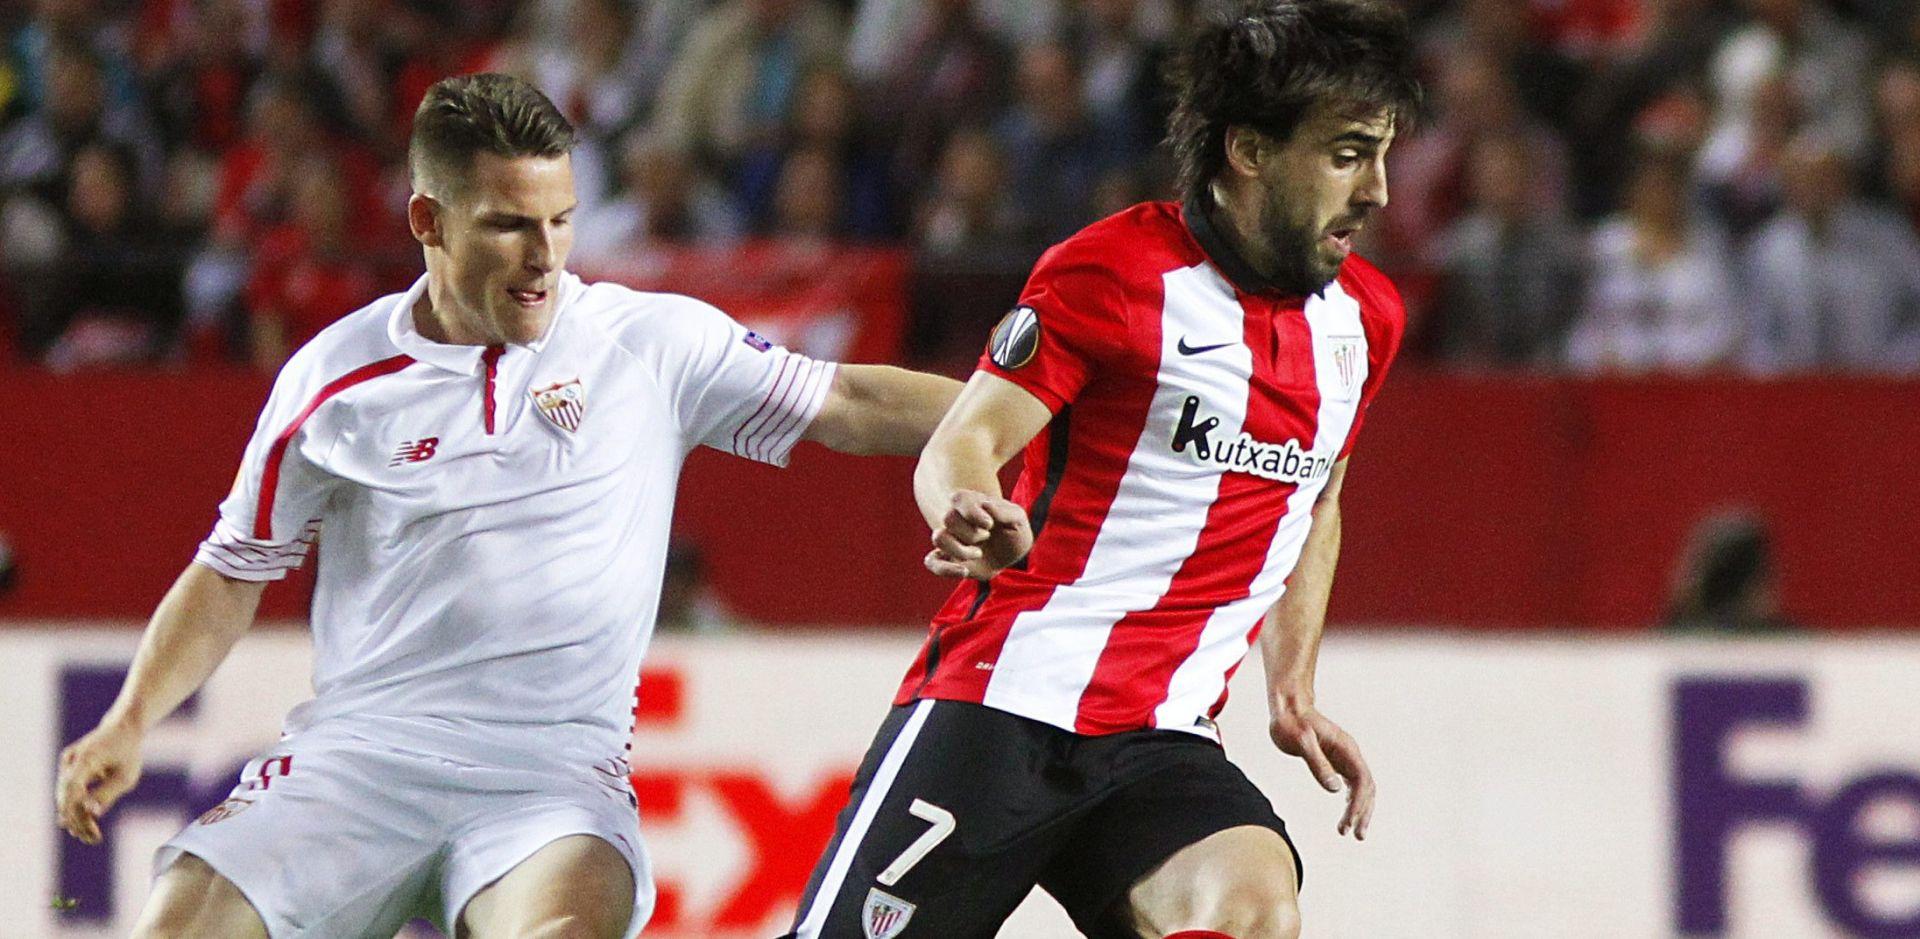 EUROPSKA LIGA:  Sevilla izborila polufinale